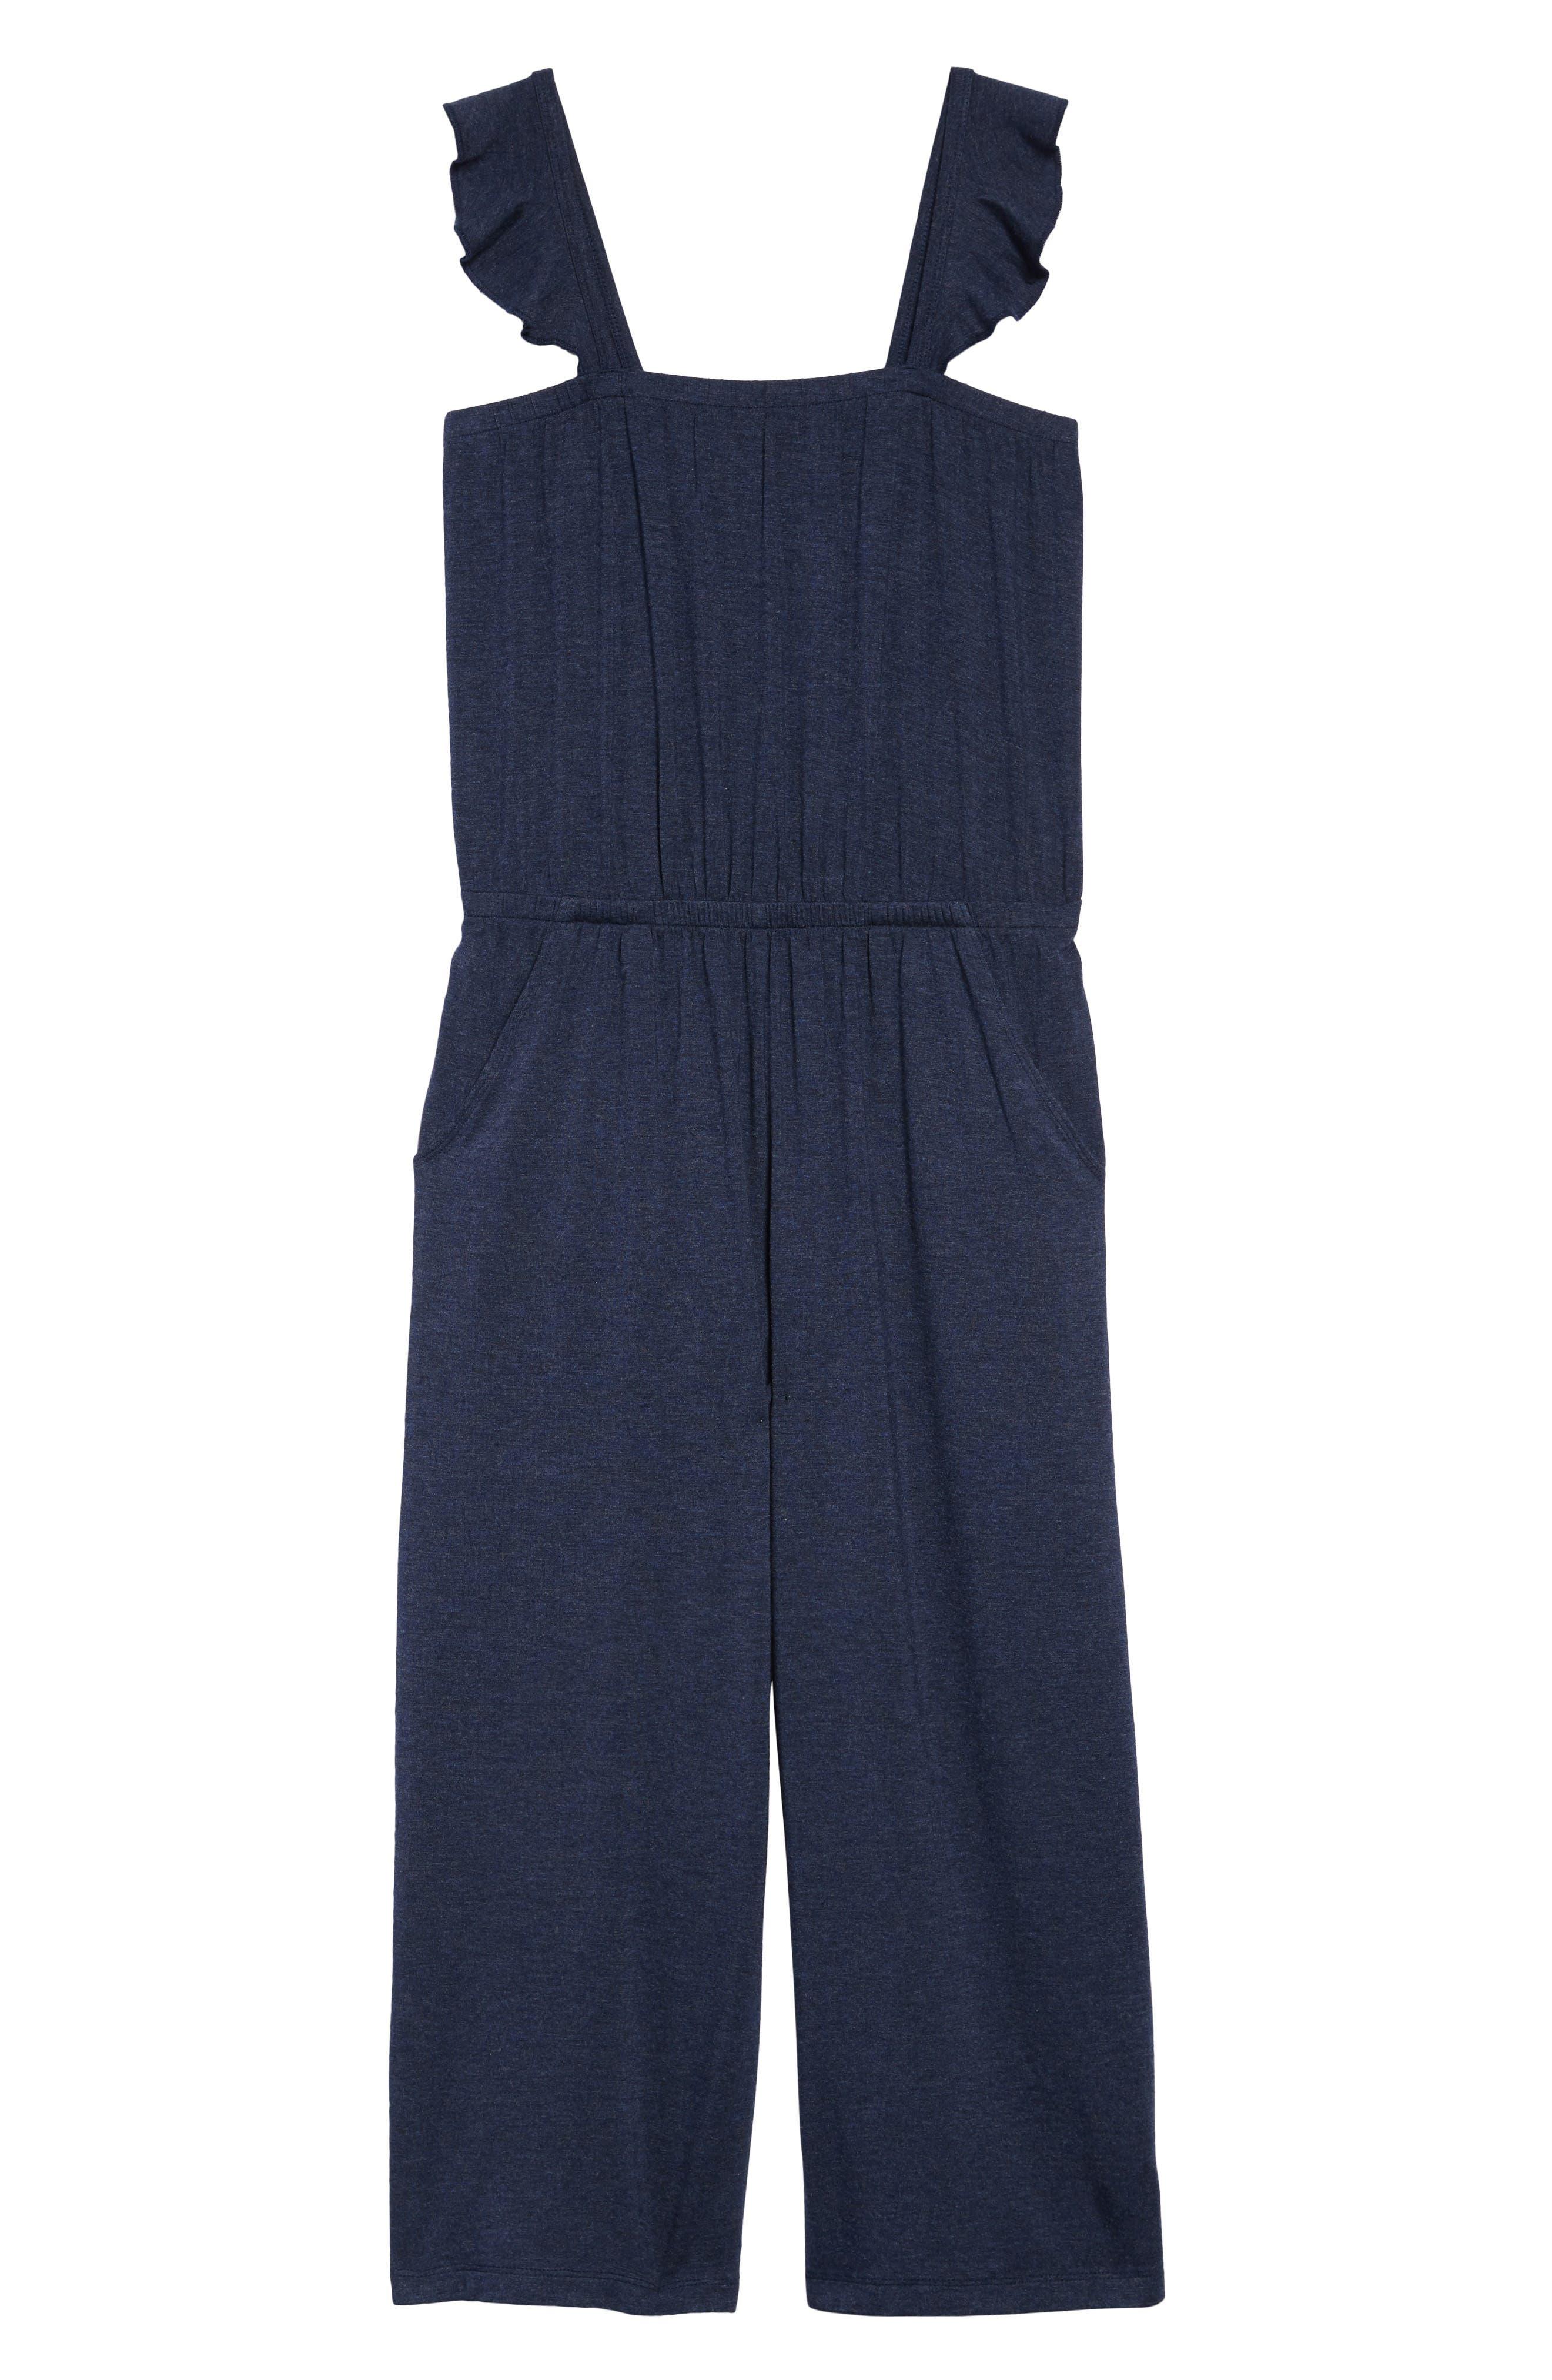 Girls Tucker  Tate Heathered Knit Jumpsuit Size XL (1416)  Blue